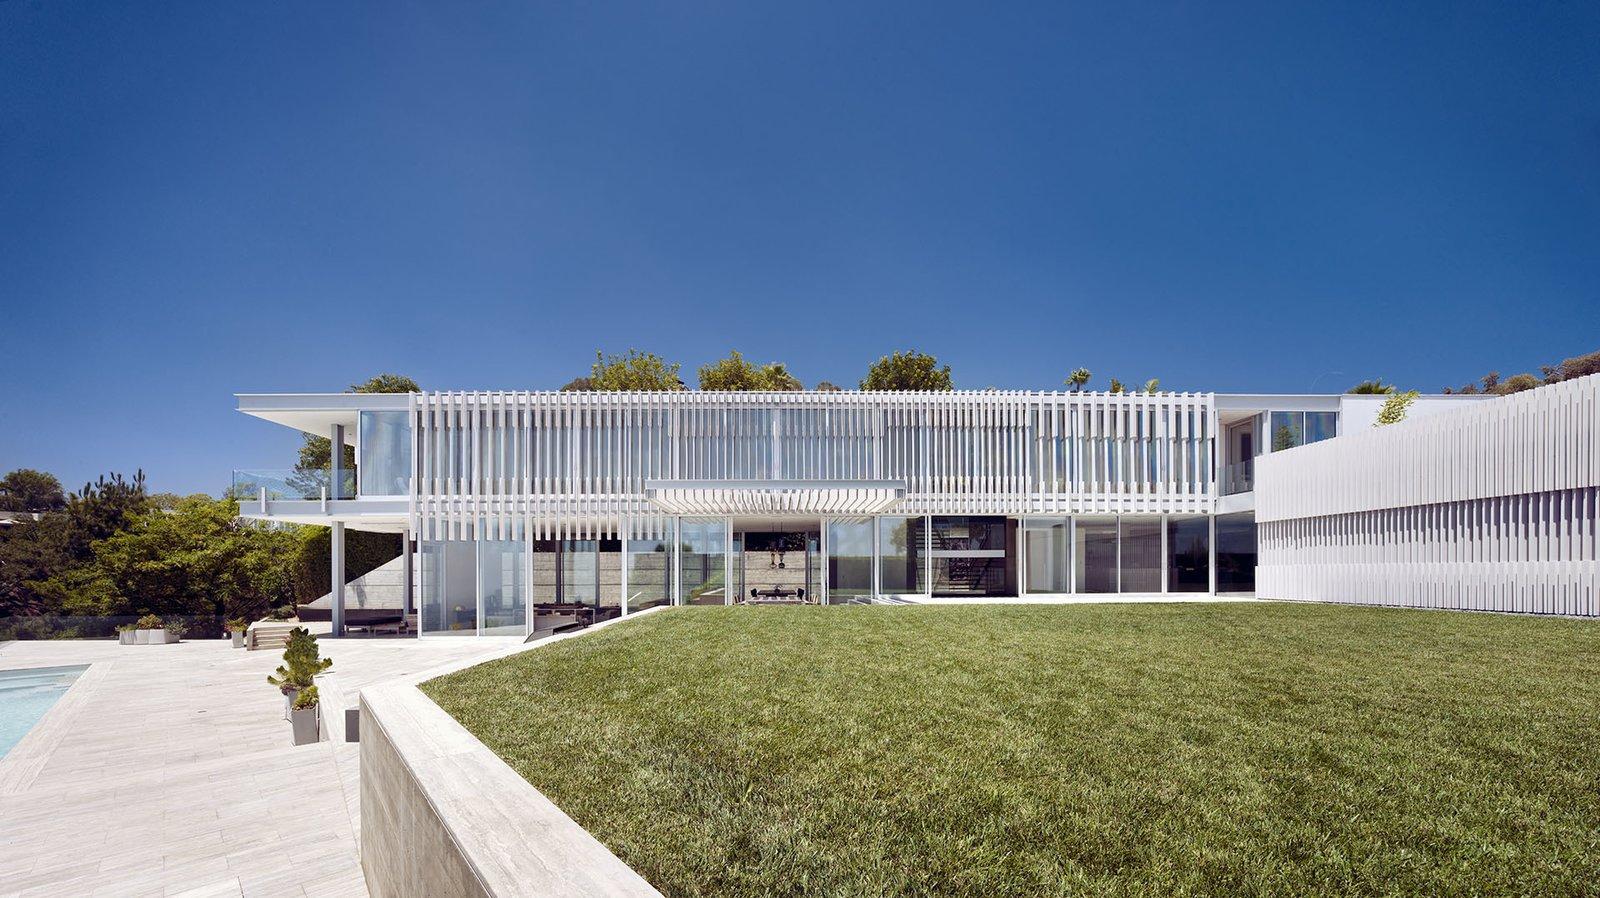 Oberfeld Residence by SPFarchitects